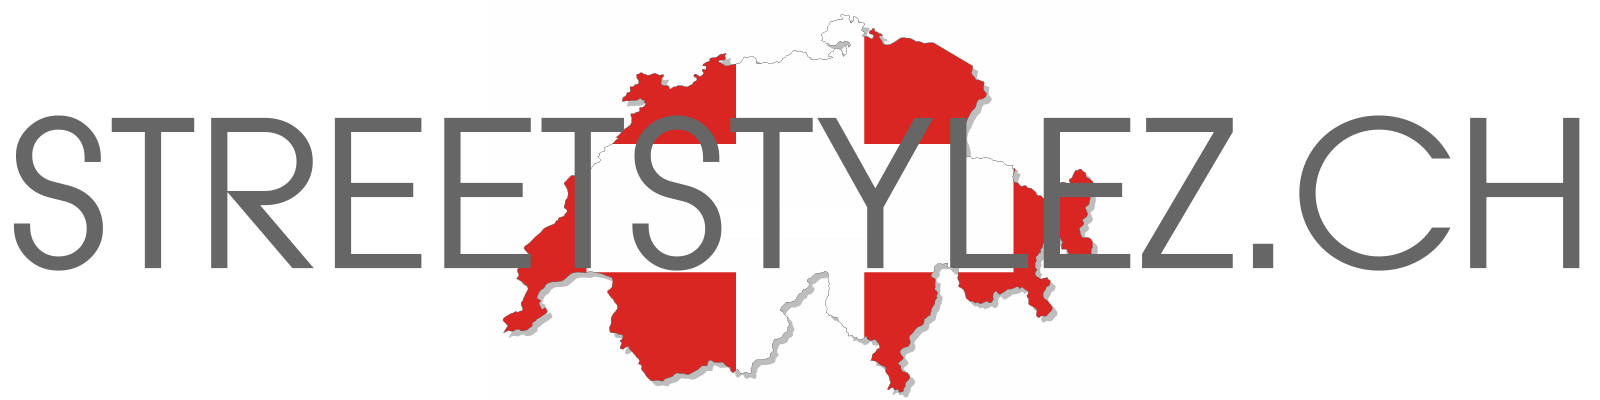 streetstylez.ch-Logo